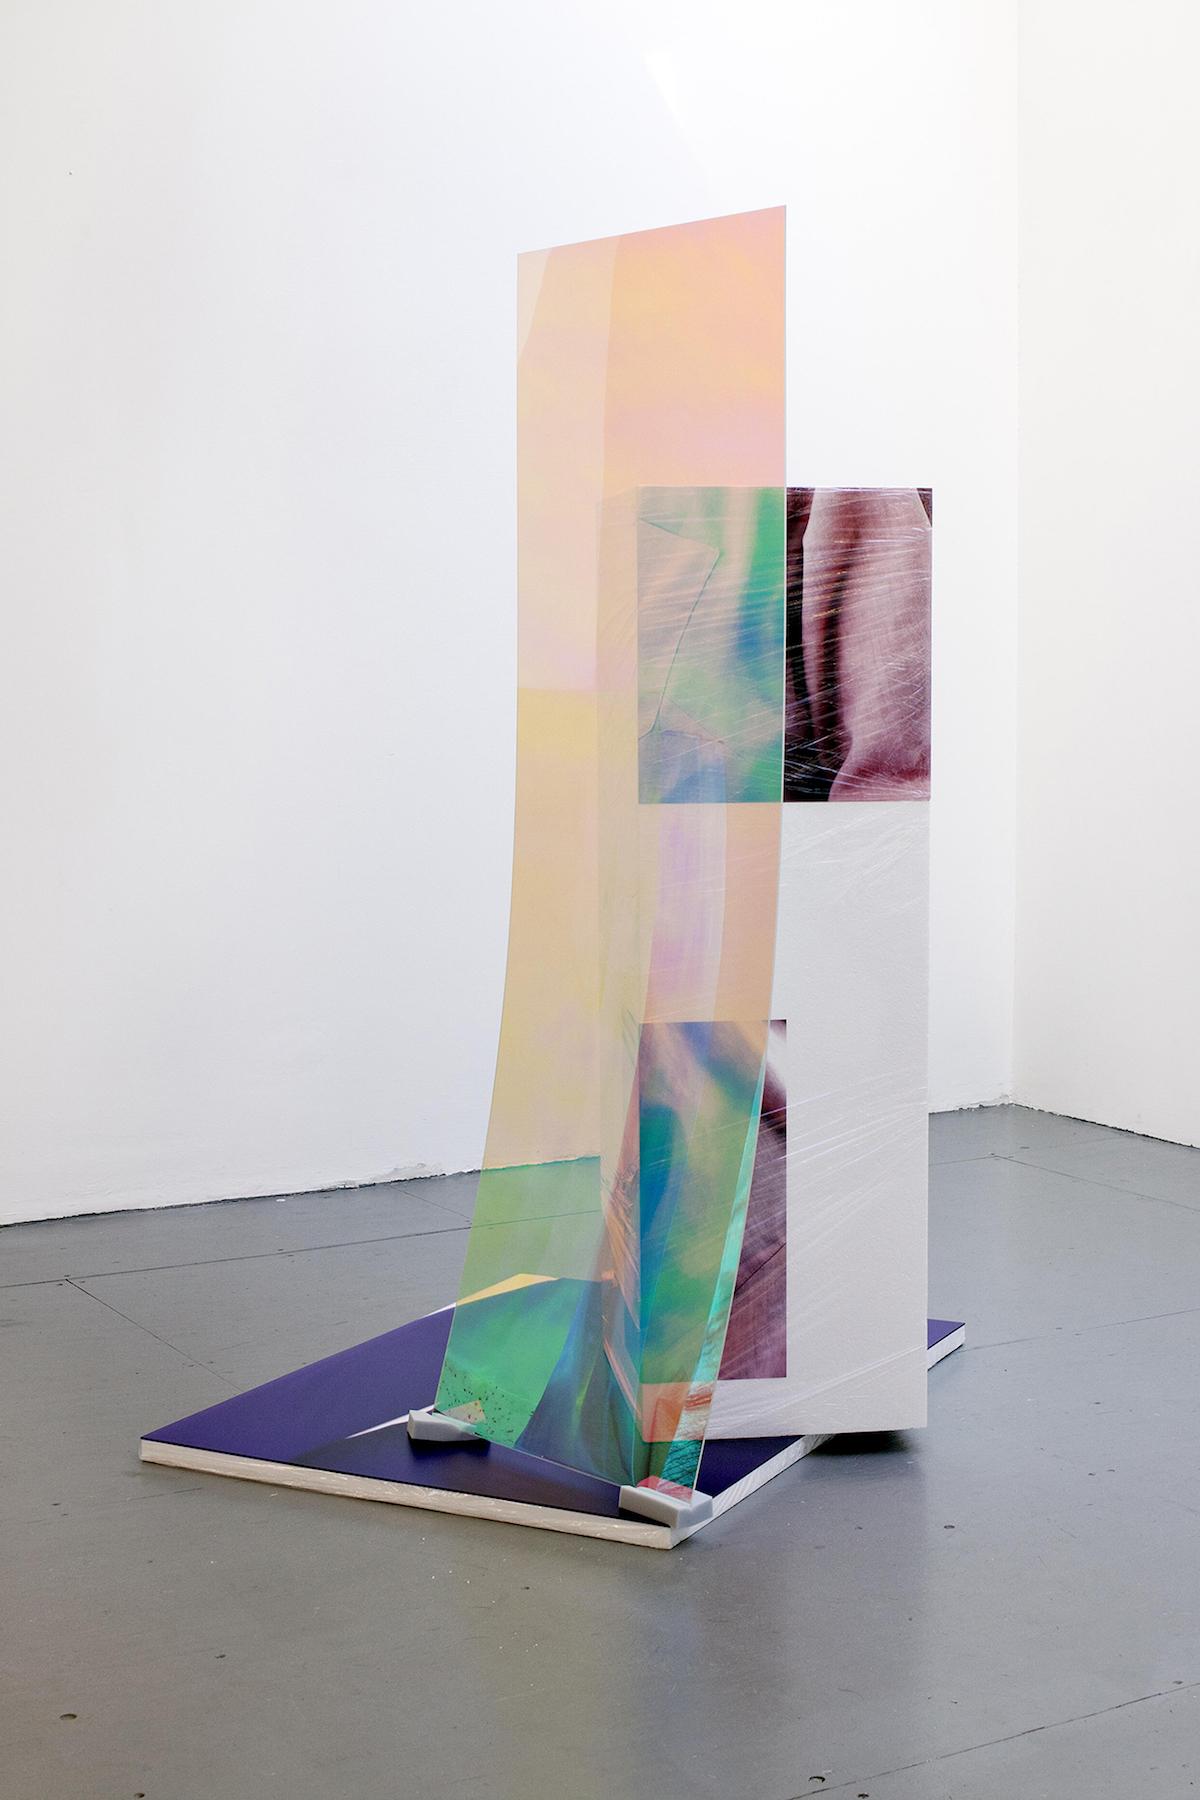 Sweaty Sculpture (back) , 167 x 90 x 107 cm, photo-stickers on polystyrene, cellophane, sponges, radiant plexiglass